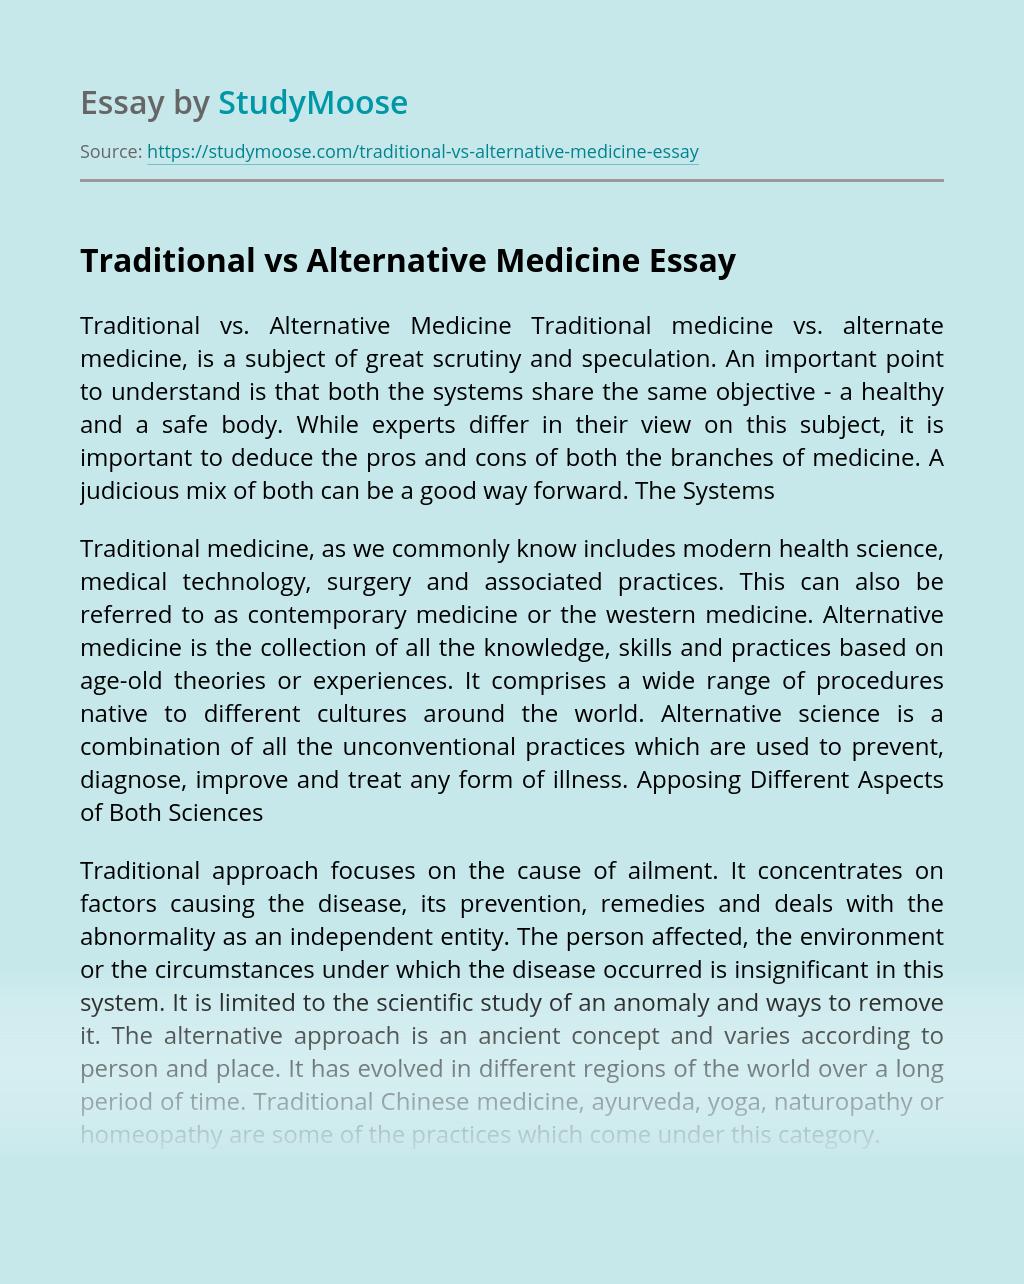 Traditional vs Alternative Medicine